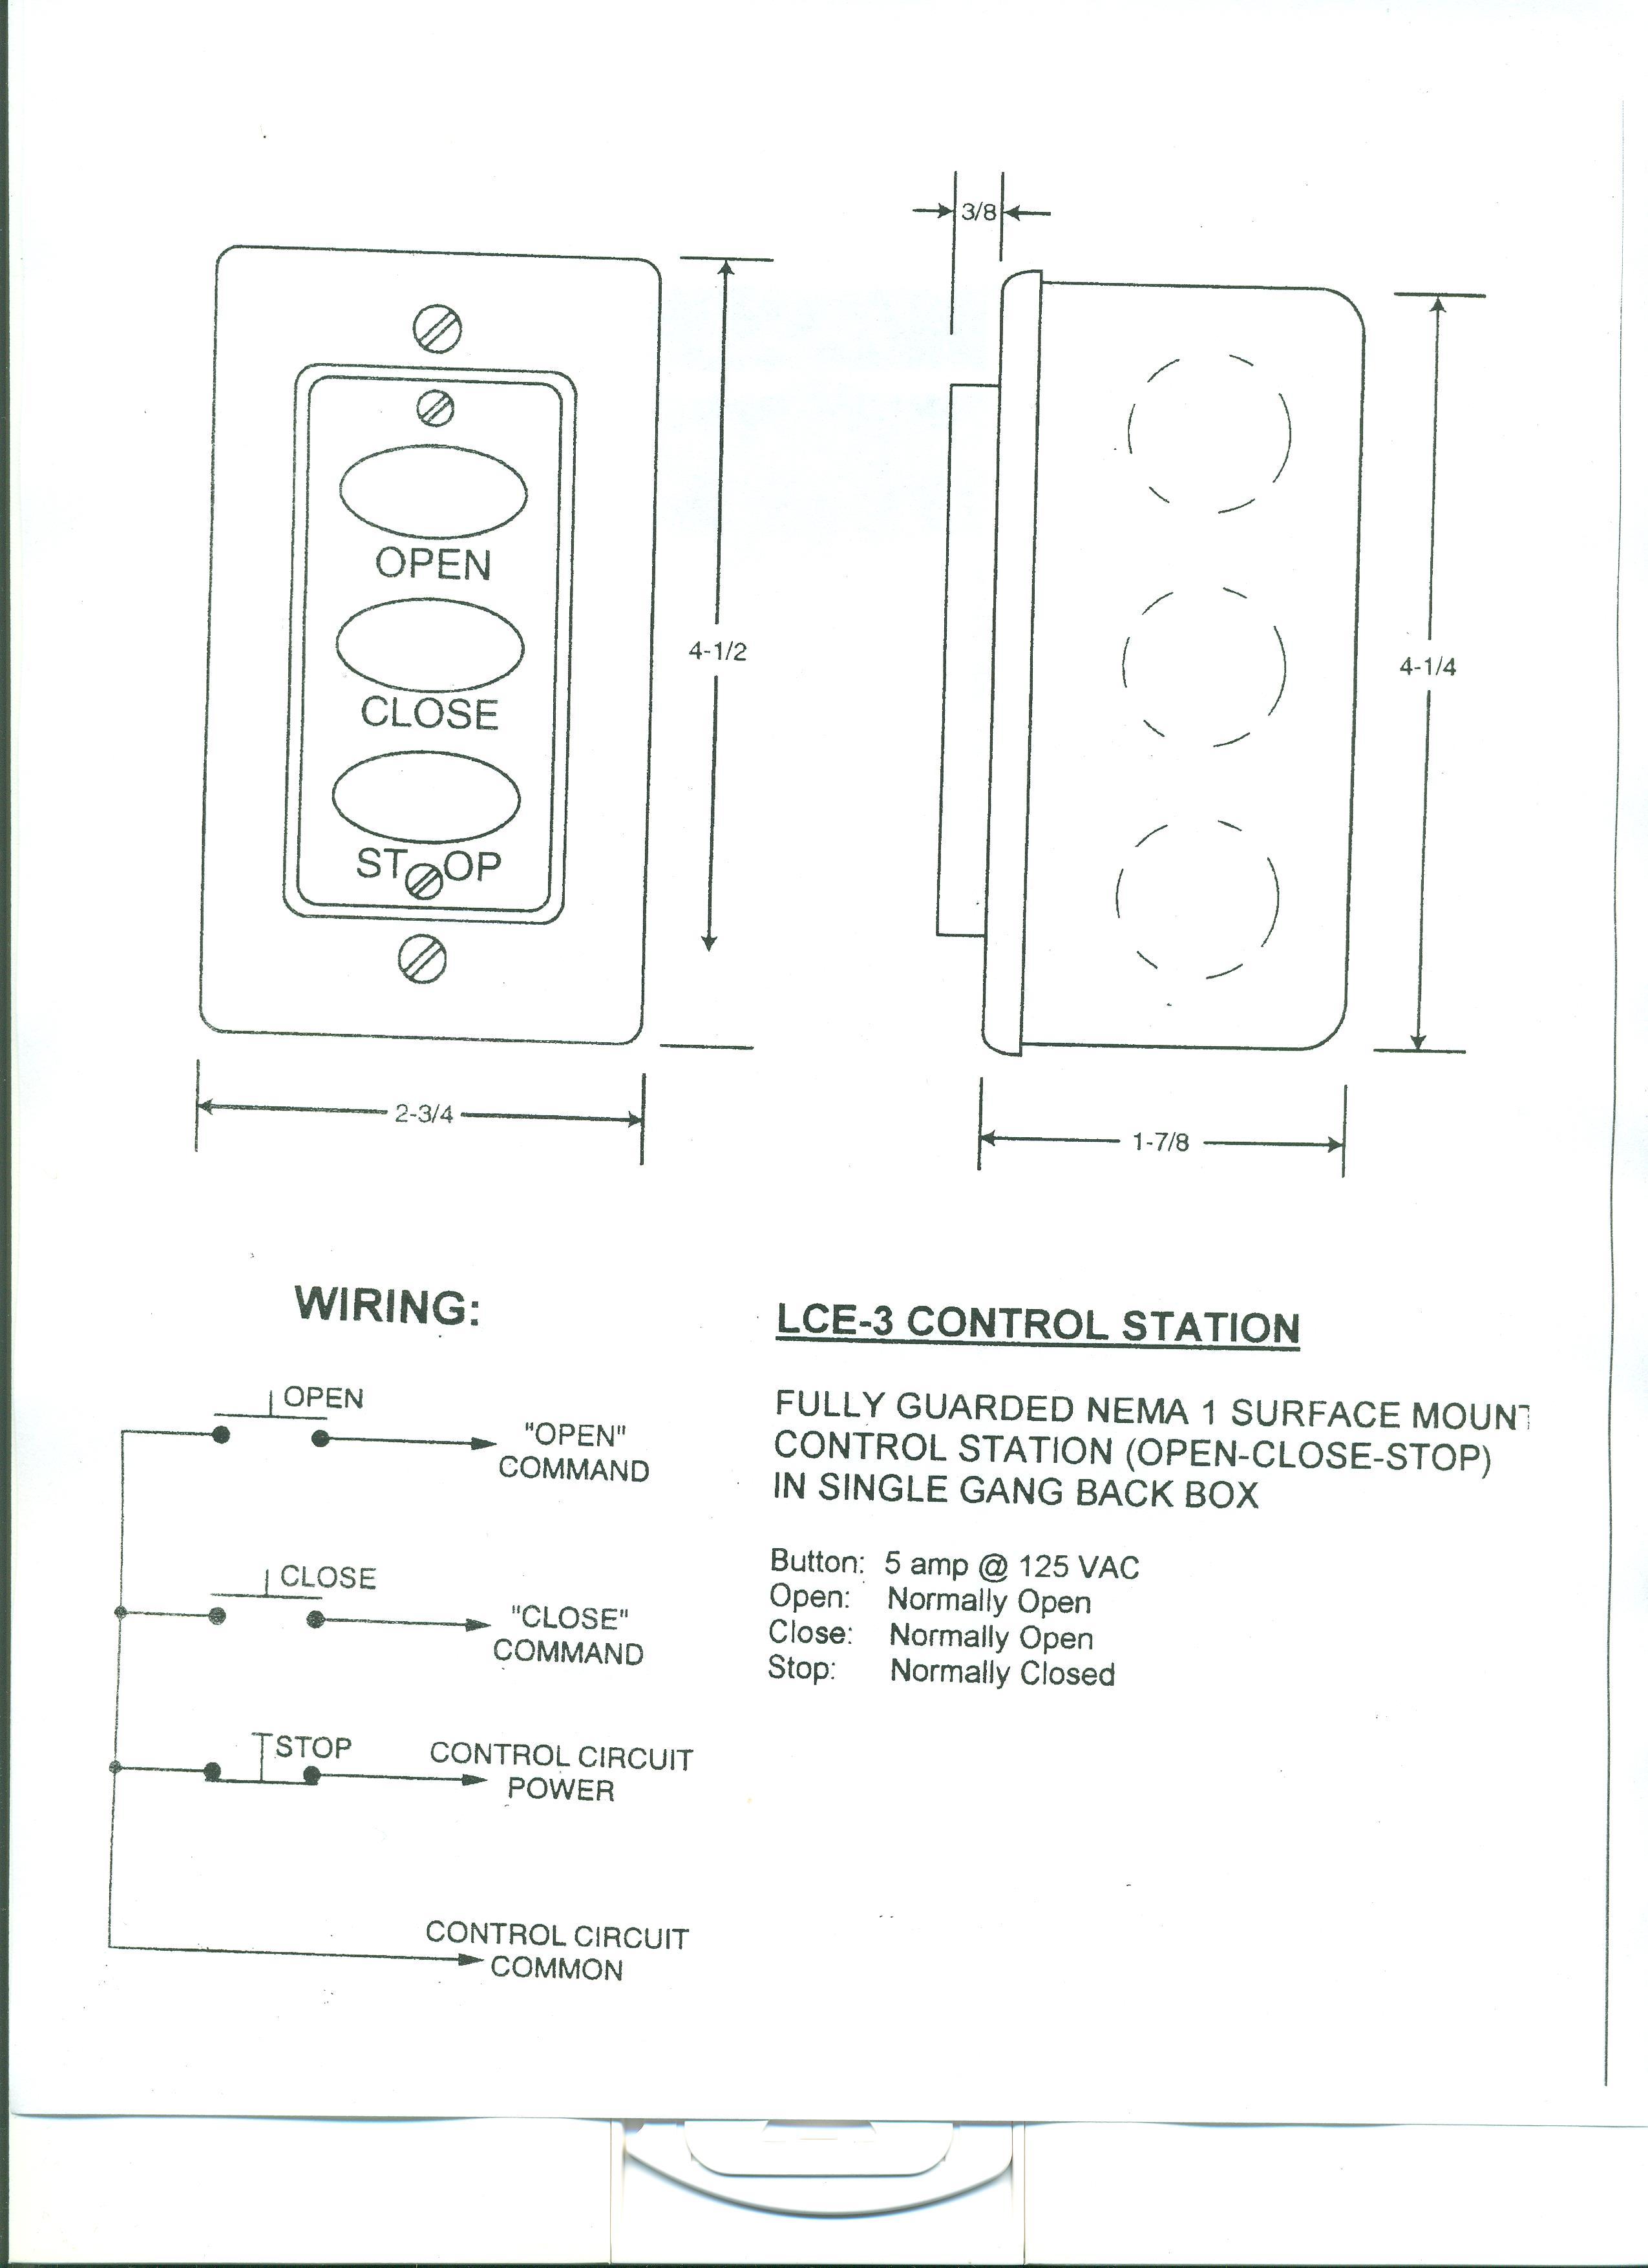 wiring diagram for liftmaster garage door opener set notation venn practice problems lce-3 three button station 001 - stuff